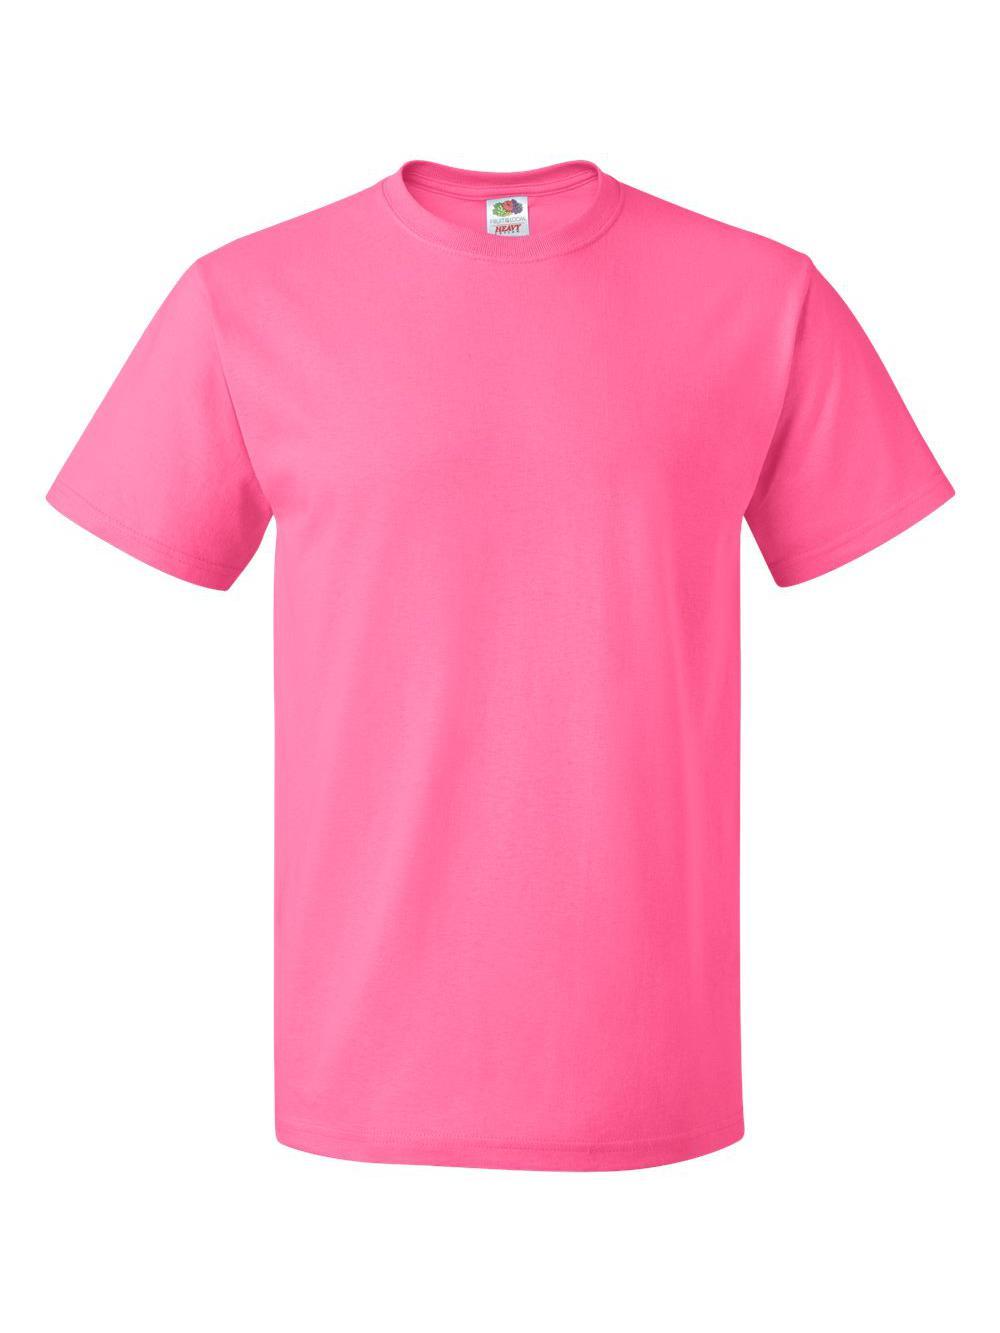 Fruit-of-the-Loom-HD-Cotton-Short-Sleeve-T-Shirt-3930R thumbnail 84